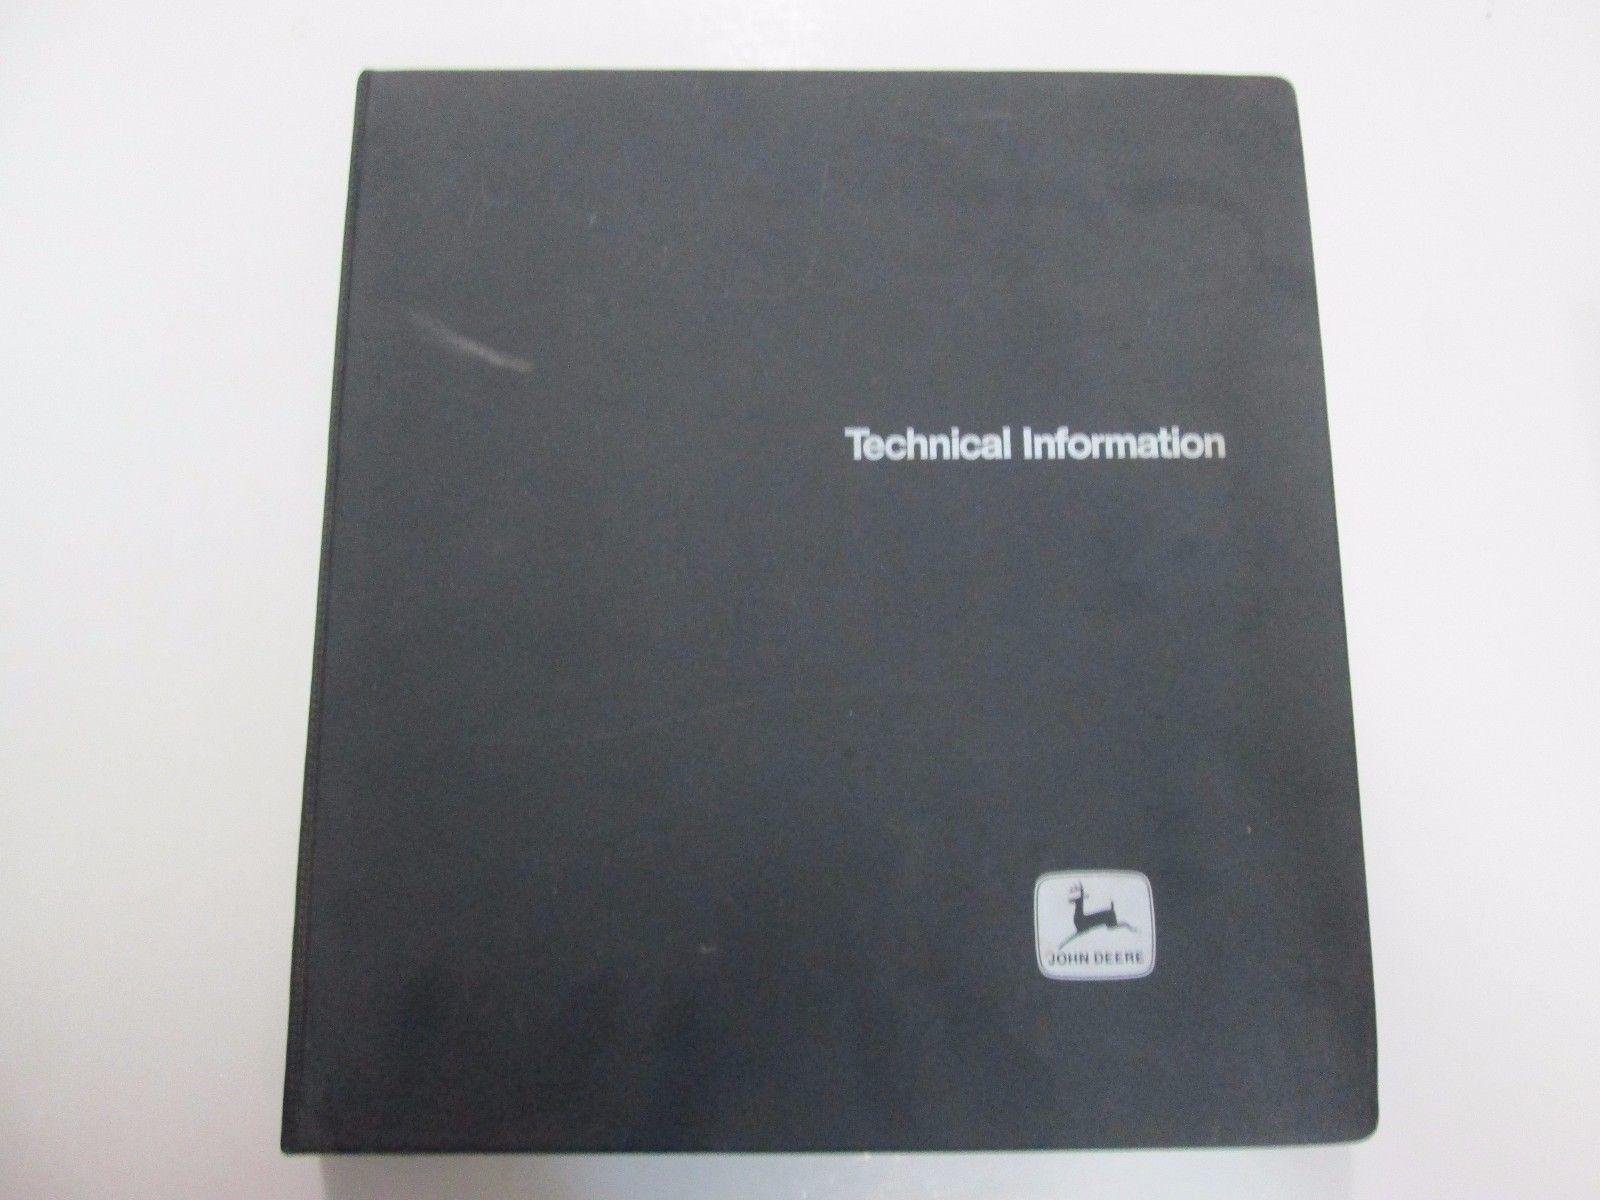 John Deere Trimmer Edgers TM-1156 Technical Manual BINDER STAINED FACTORY  OEM 87